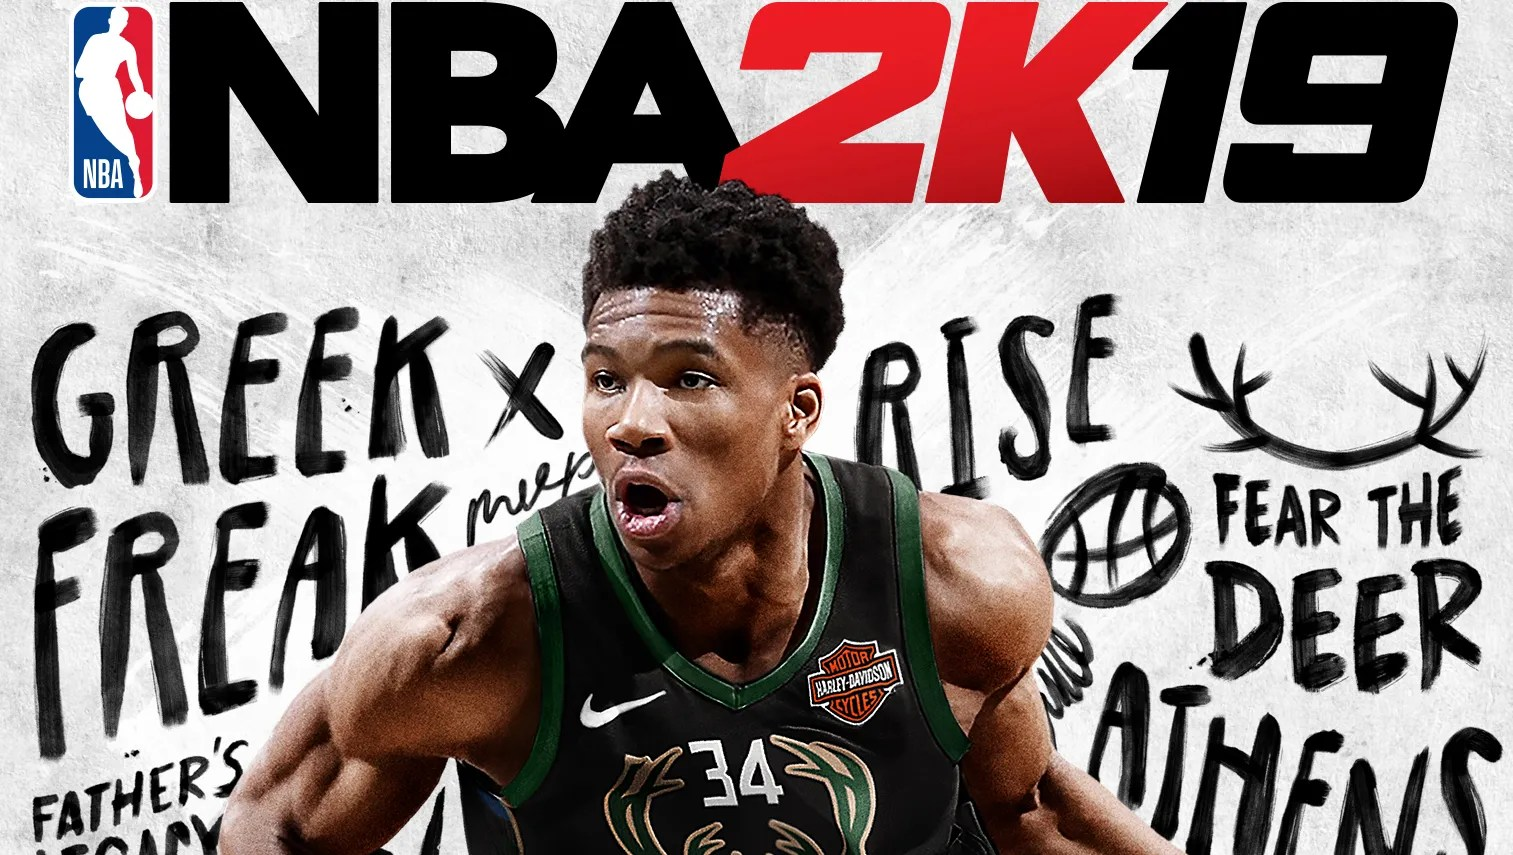 Giannis Antetokounmpo unveiled as NBA 2K19 cover star